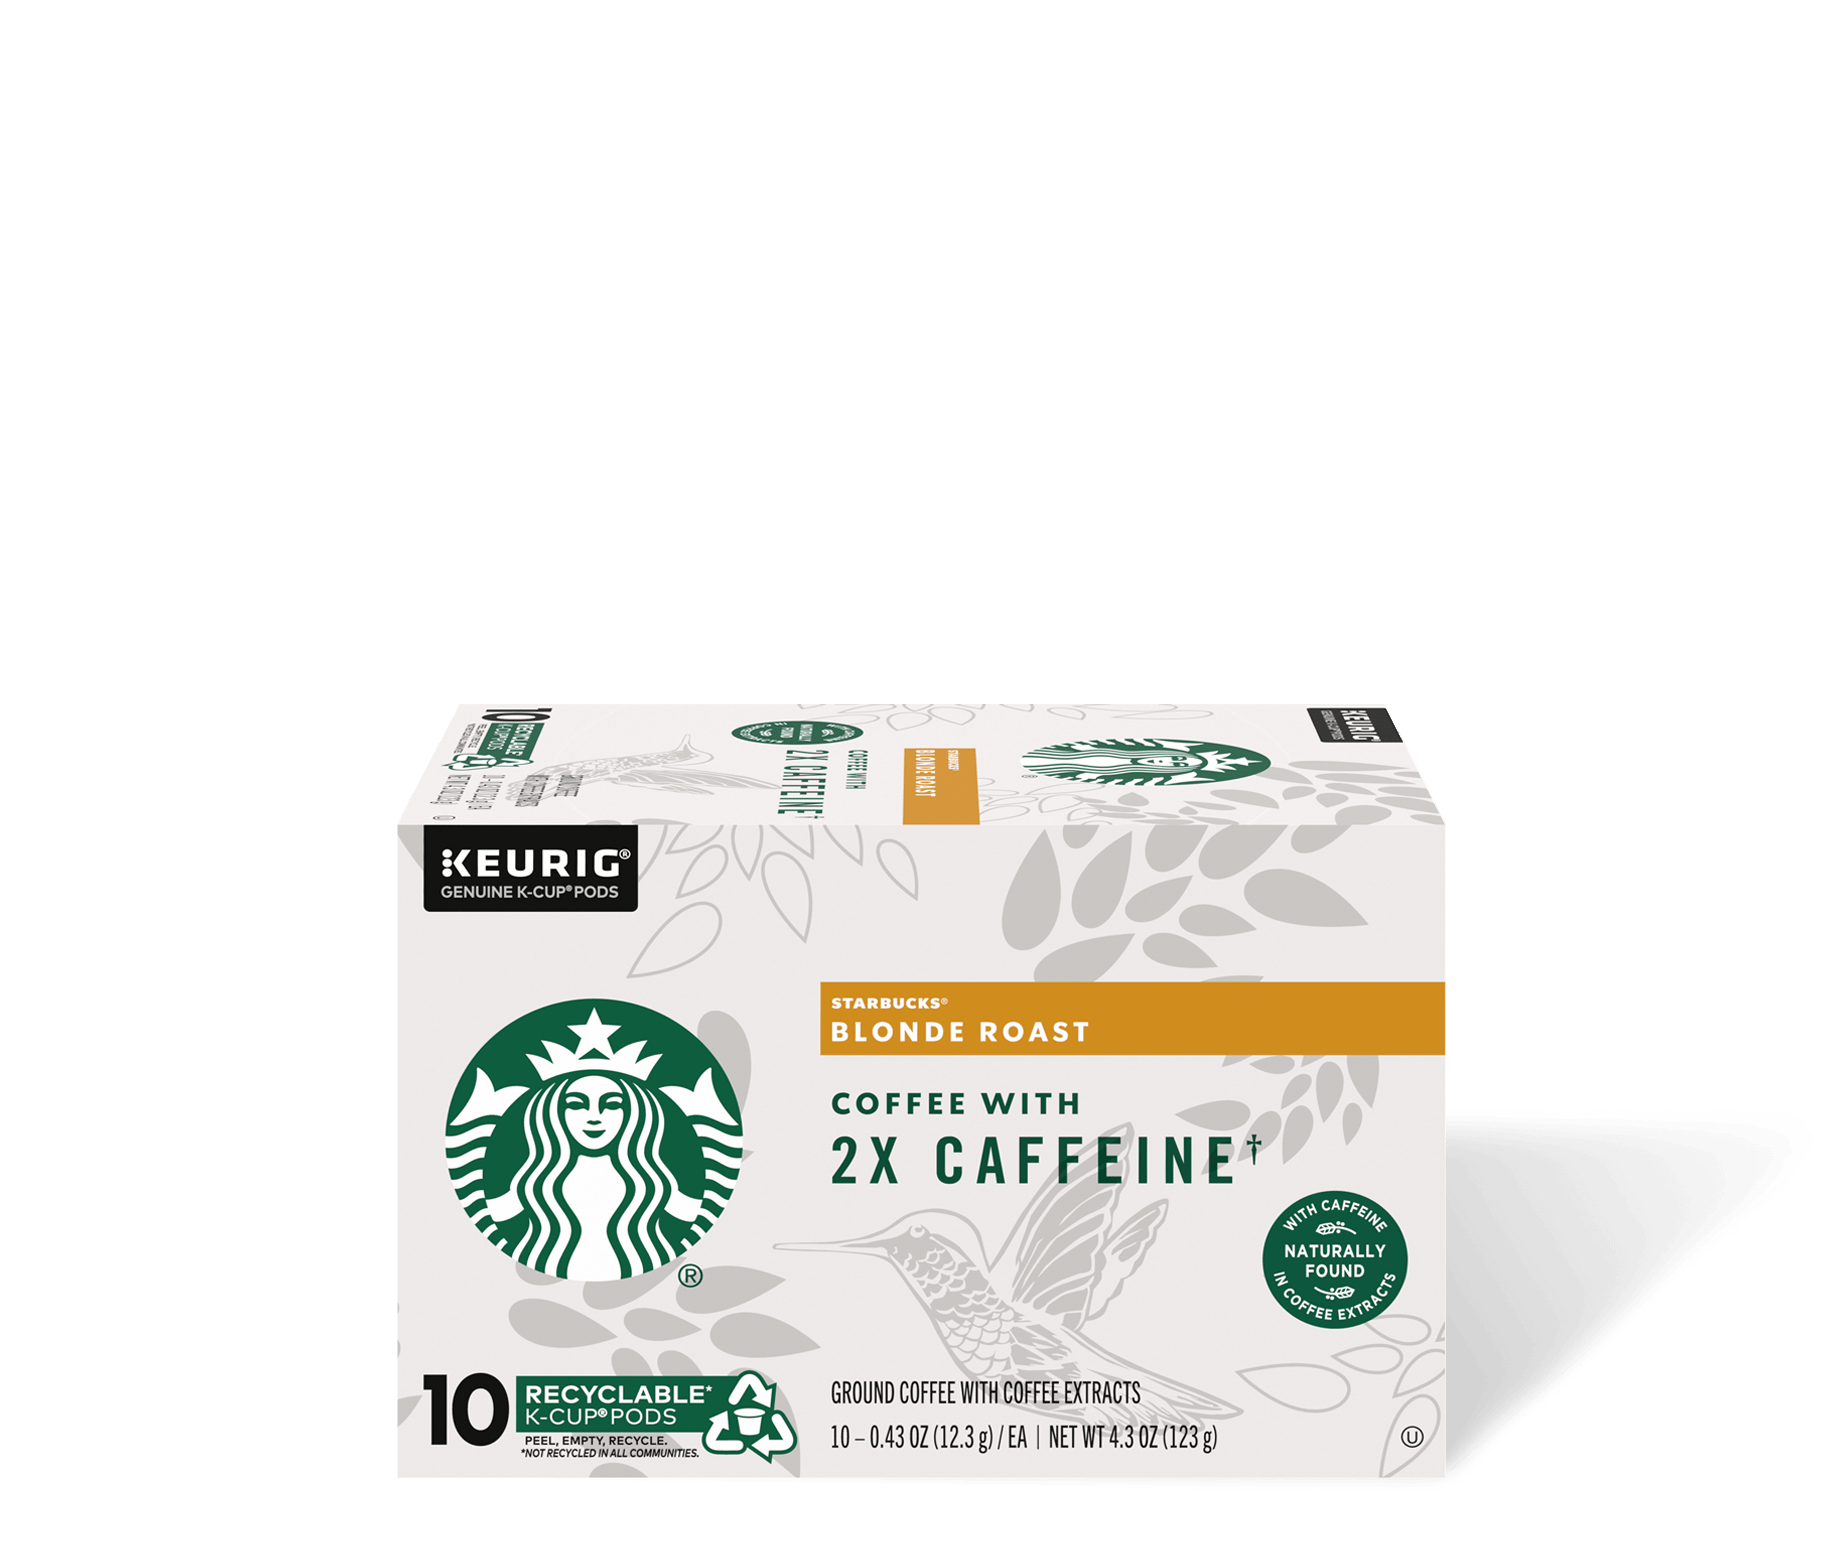 Starbucks® Blonde Roast Coffee With 2X Caffeine